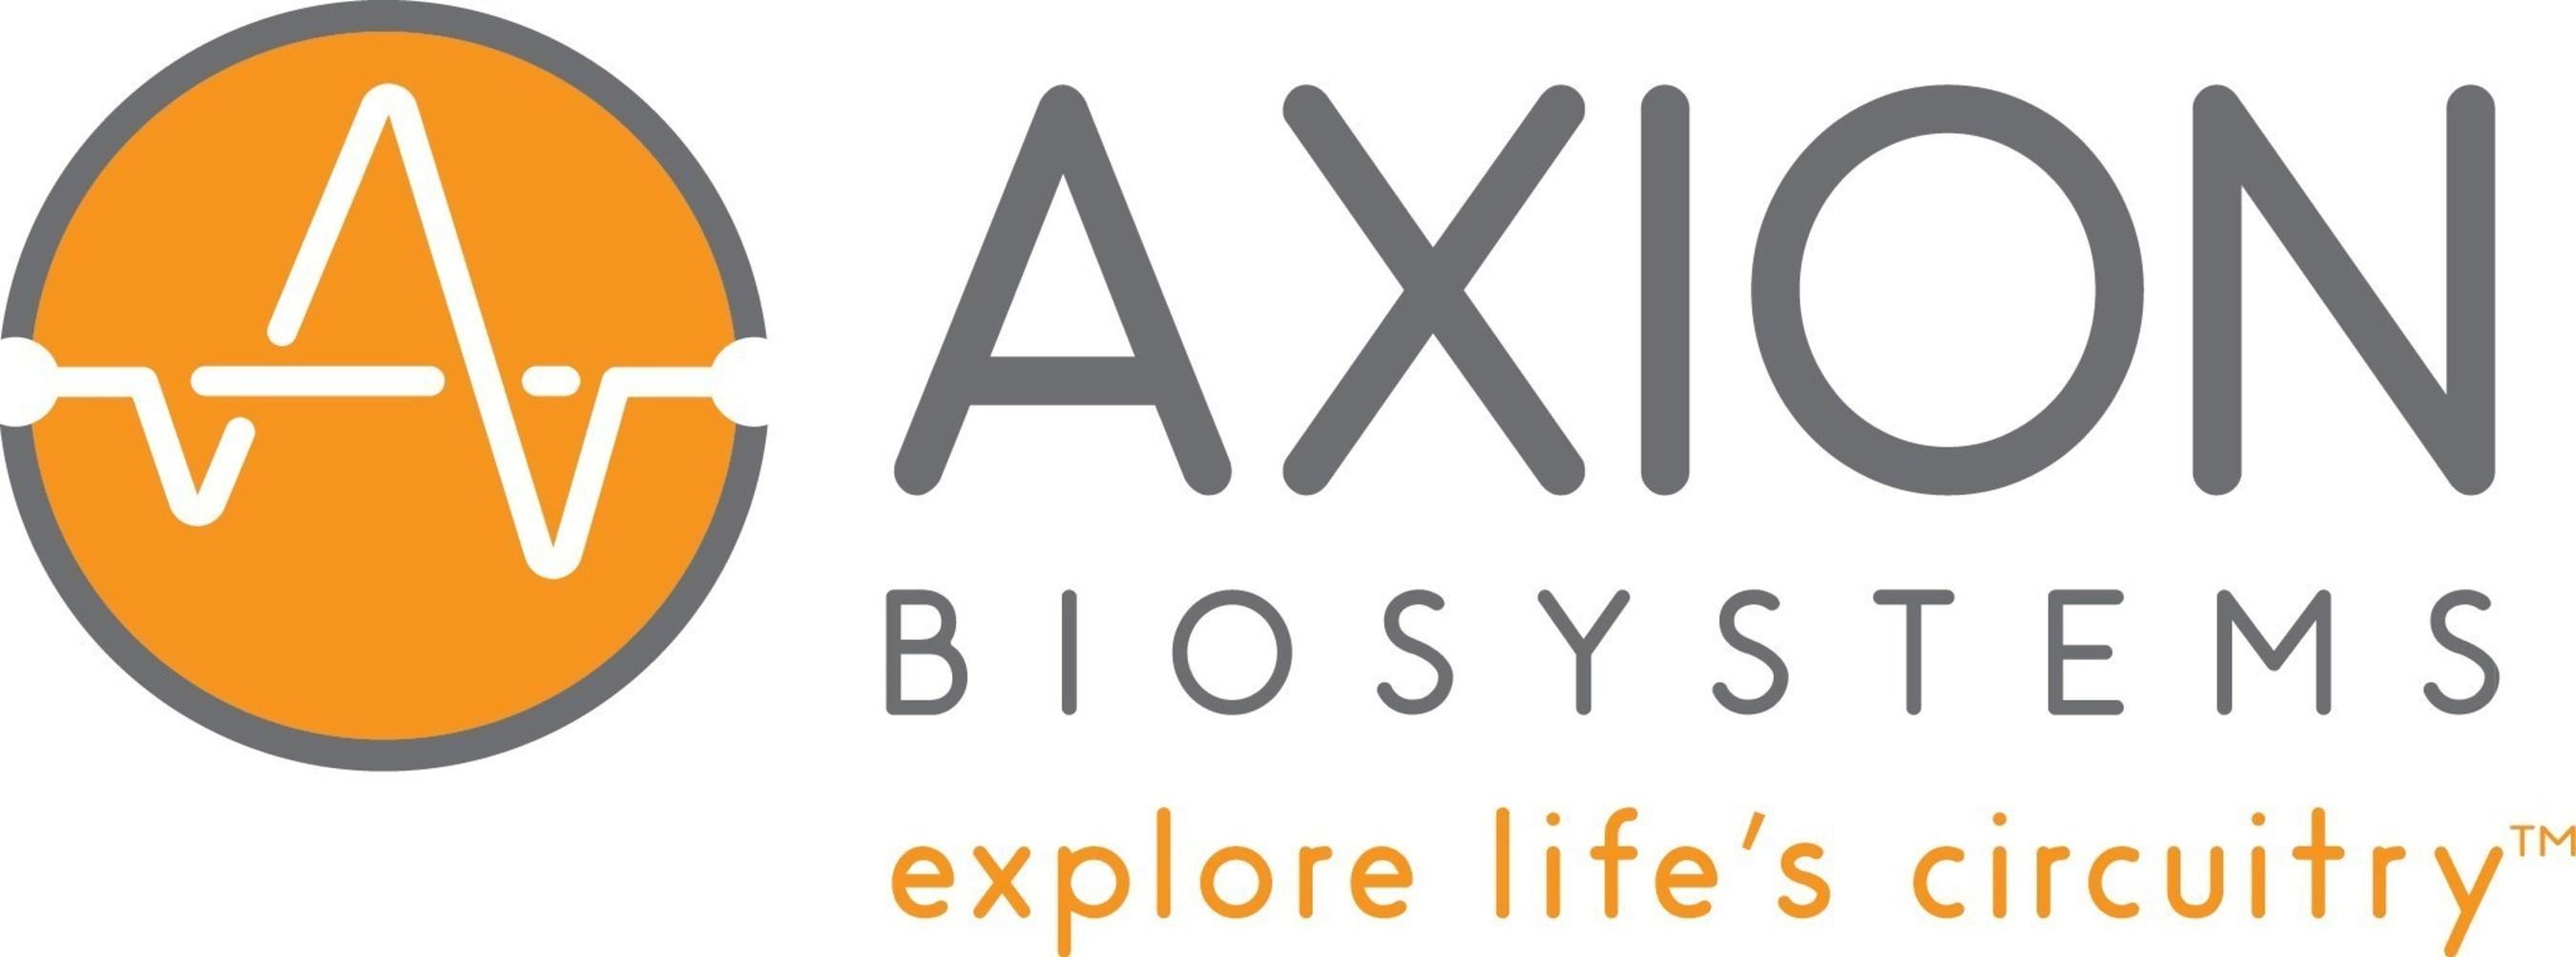 Axion Biosystems logo